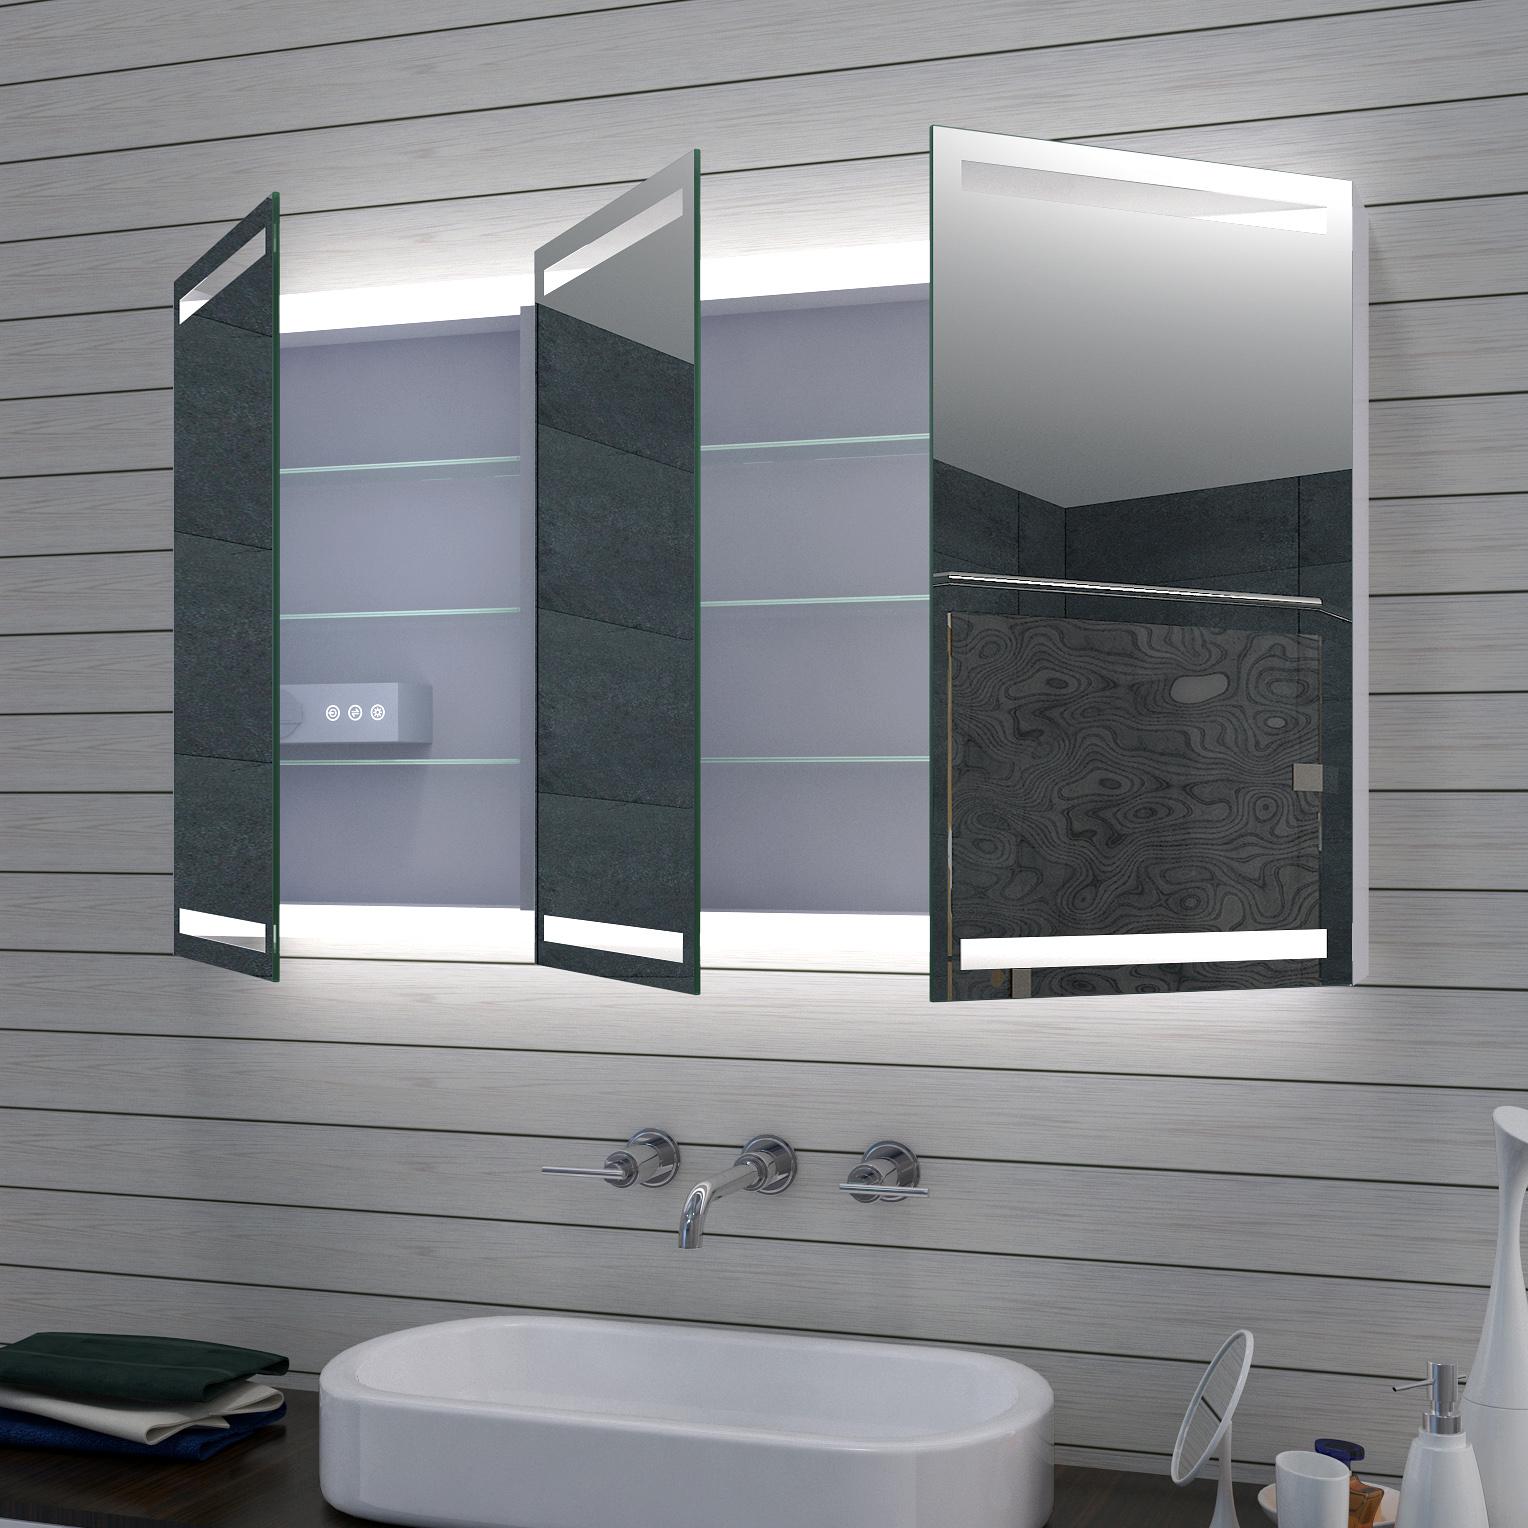 Www Lux Aqua De Aluminium Led Beleuchtung Badezimmer